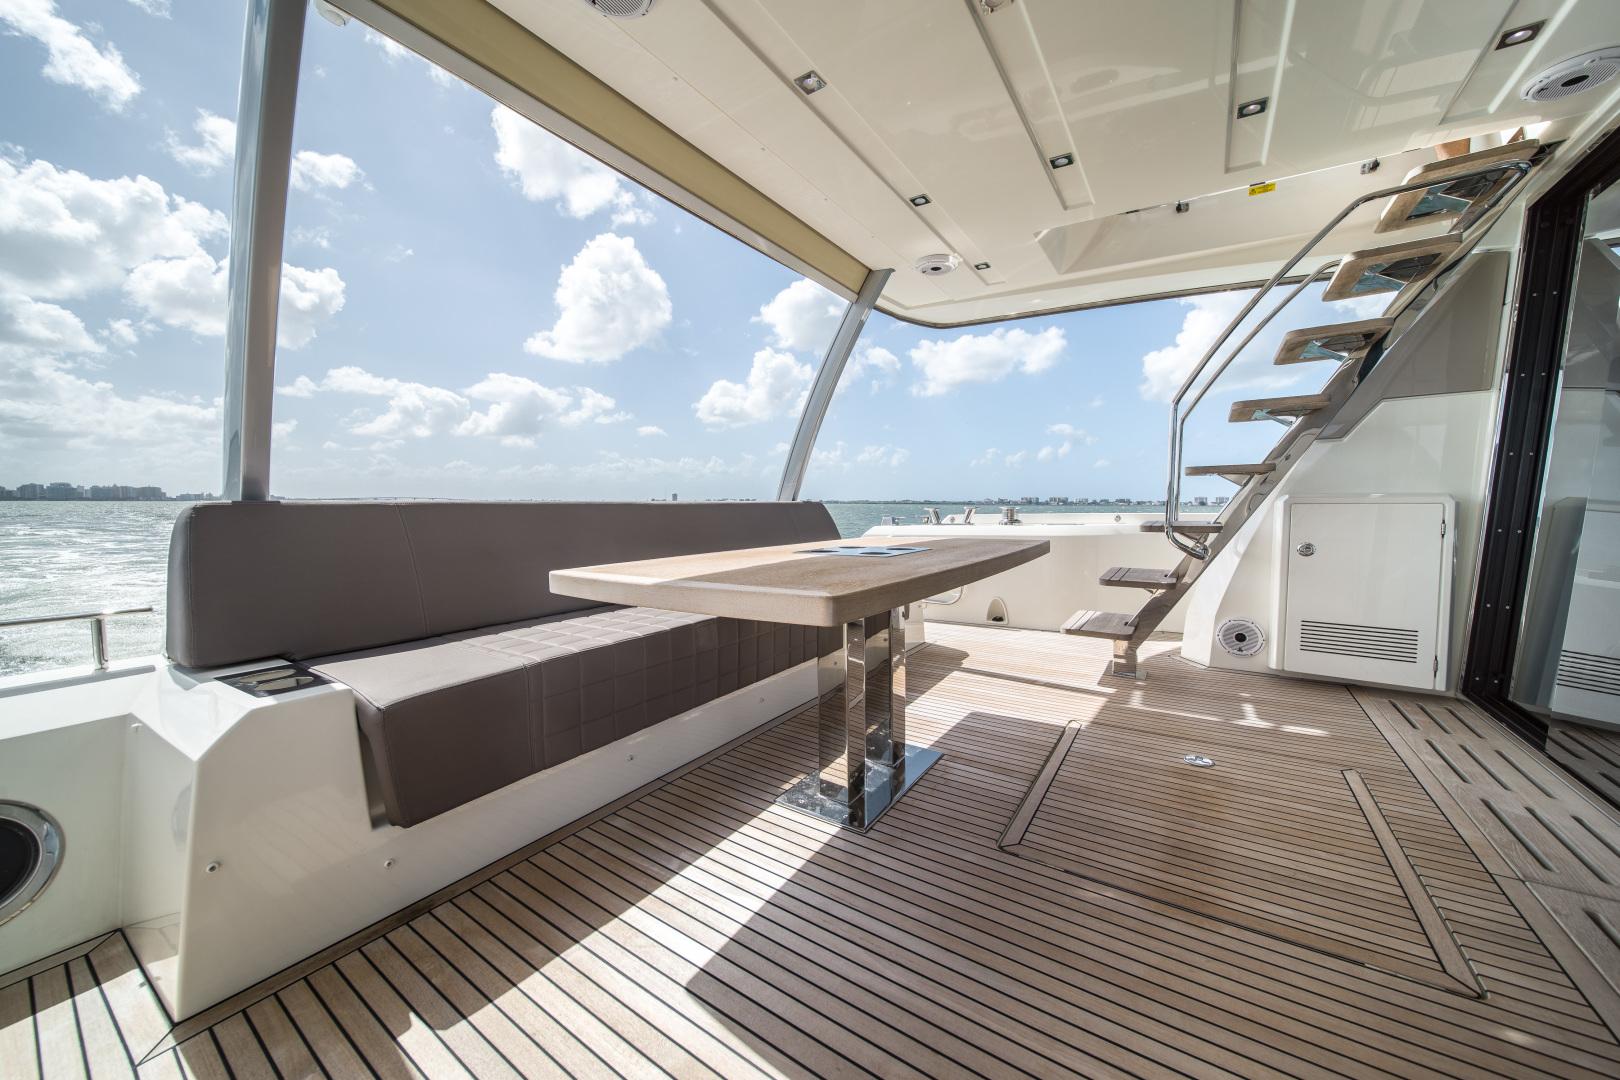 Prestige-680 Flybridge 2018-Seduction Sarasota-Florida-United States-2018 68 Prestige 680 Flybridge  Cockpit Aft Deck-1498993 | Thumbnail